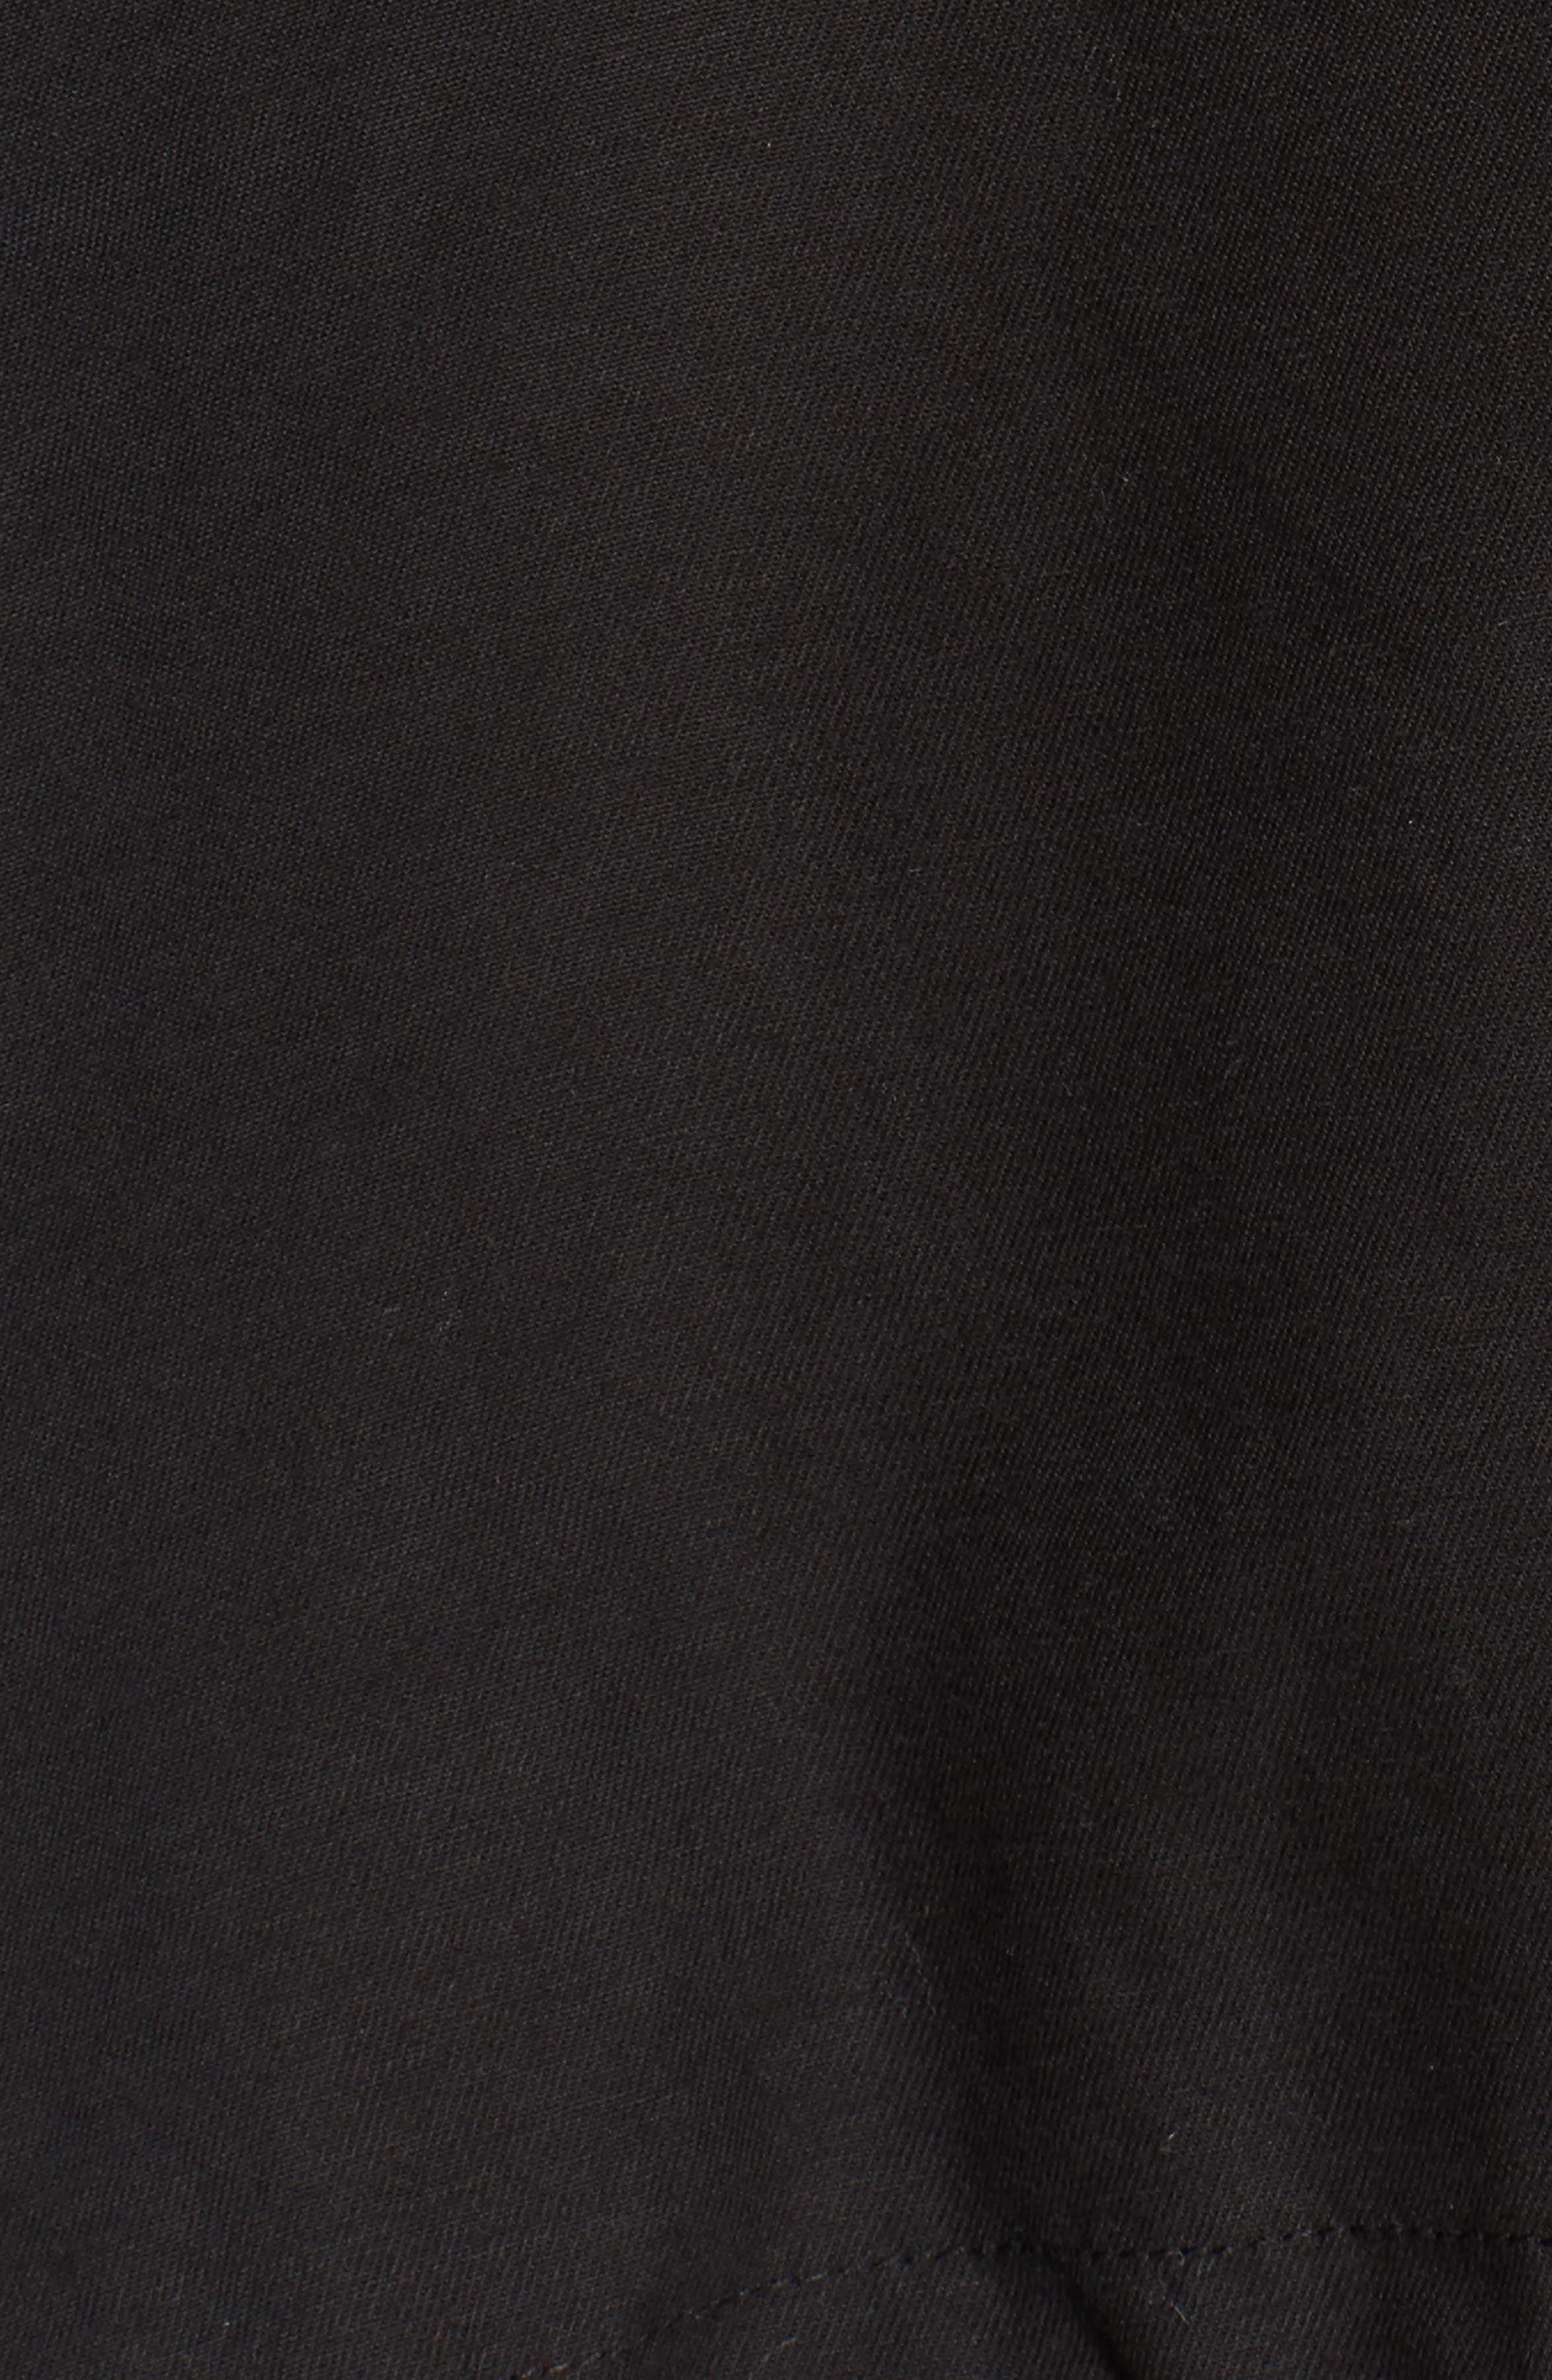 Hooded Cotton Utility Jacket,                             Alternate thumbnail 6, color,                             001